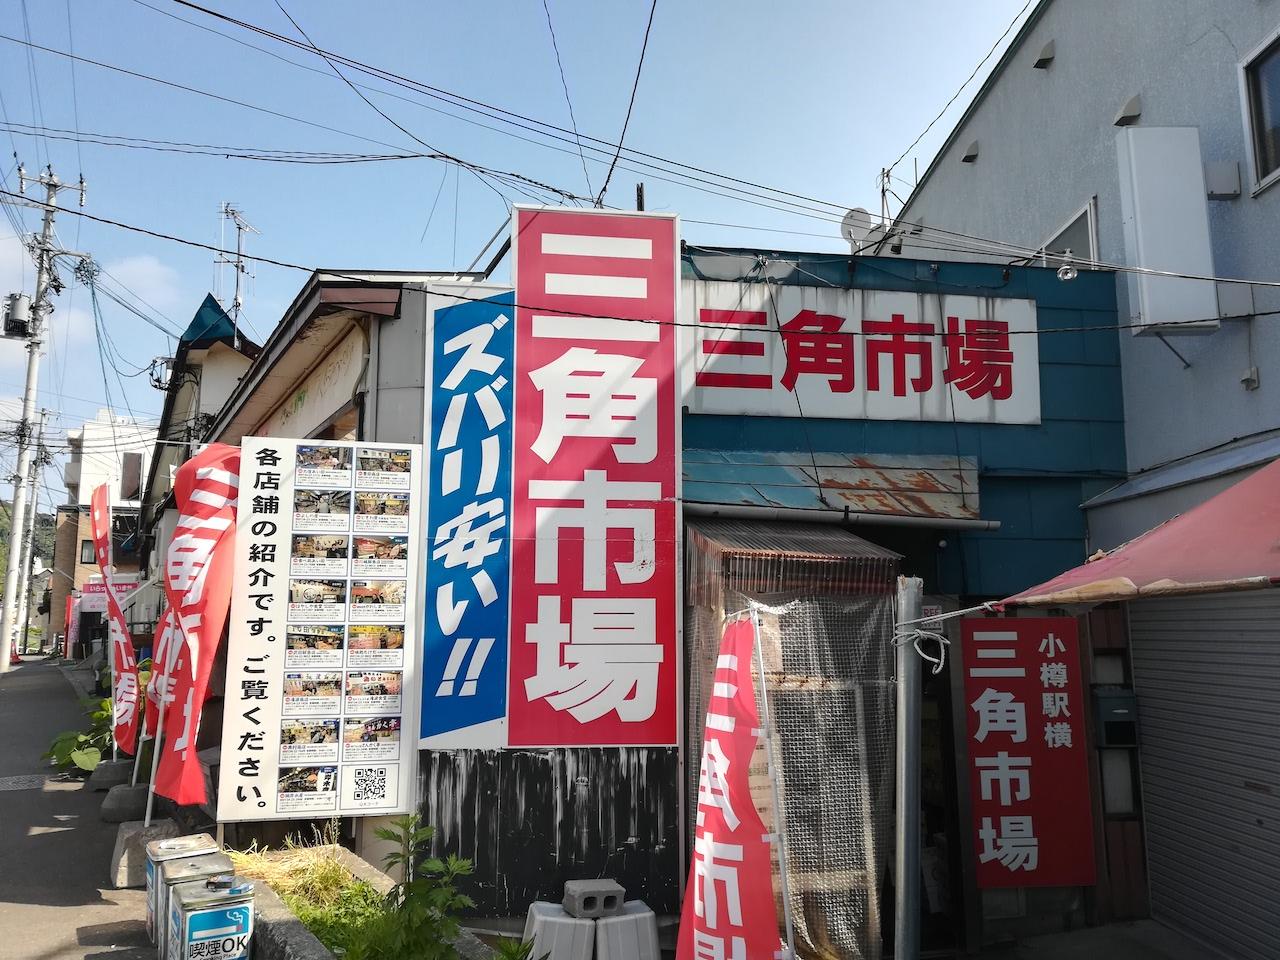 http://morning.tokyo-review.com/images/IMG_20190610_084527.jpg